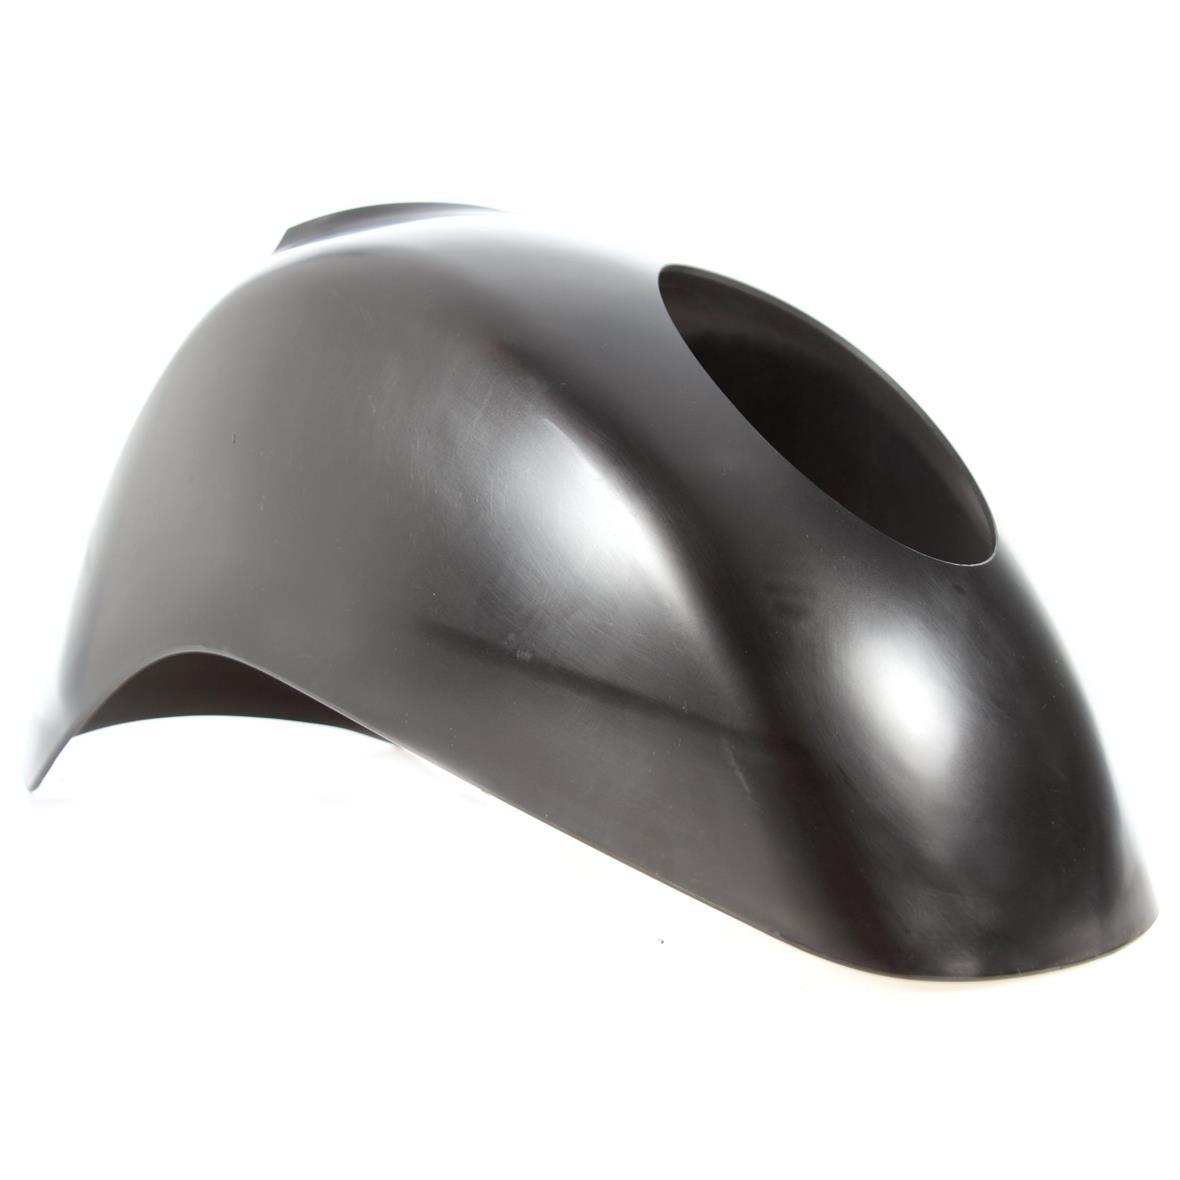 "Product Image for 'Mudguard PIAGGIO ""Fender Light""Title'"